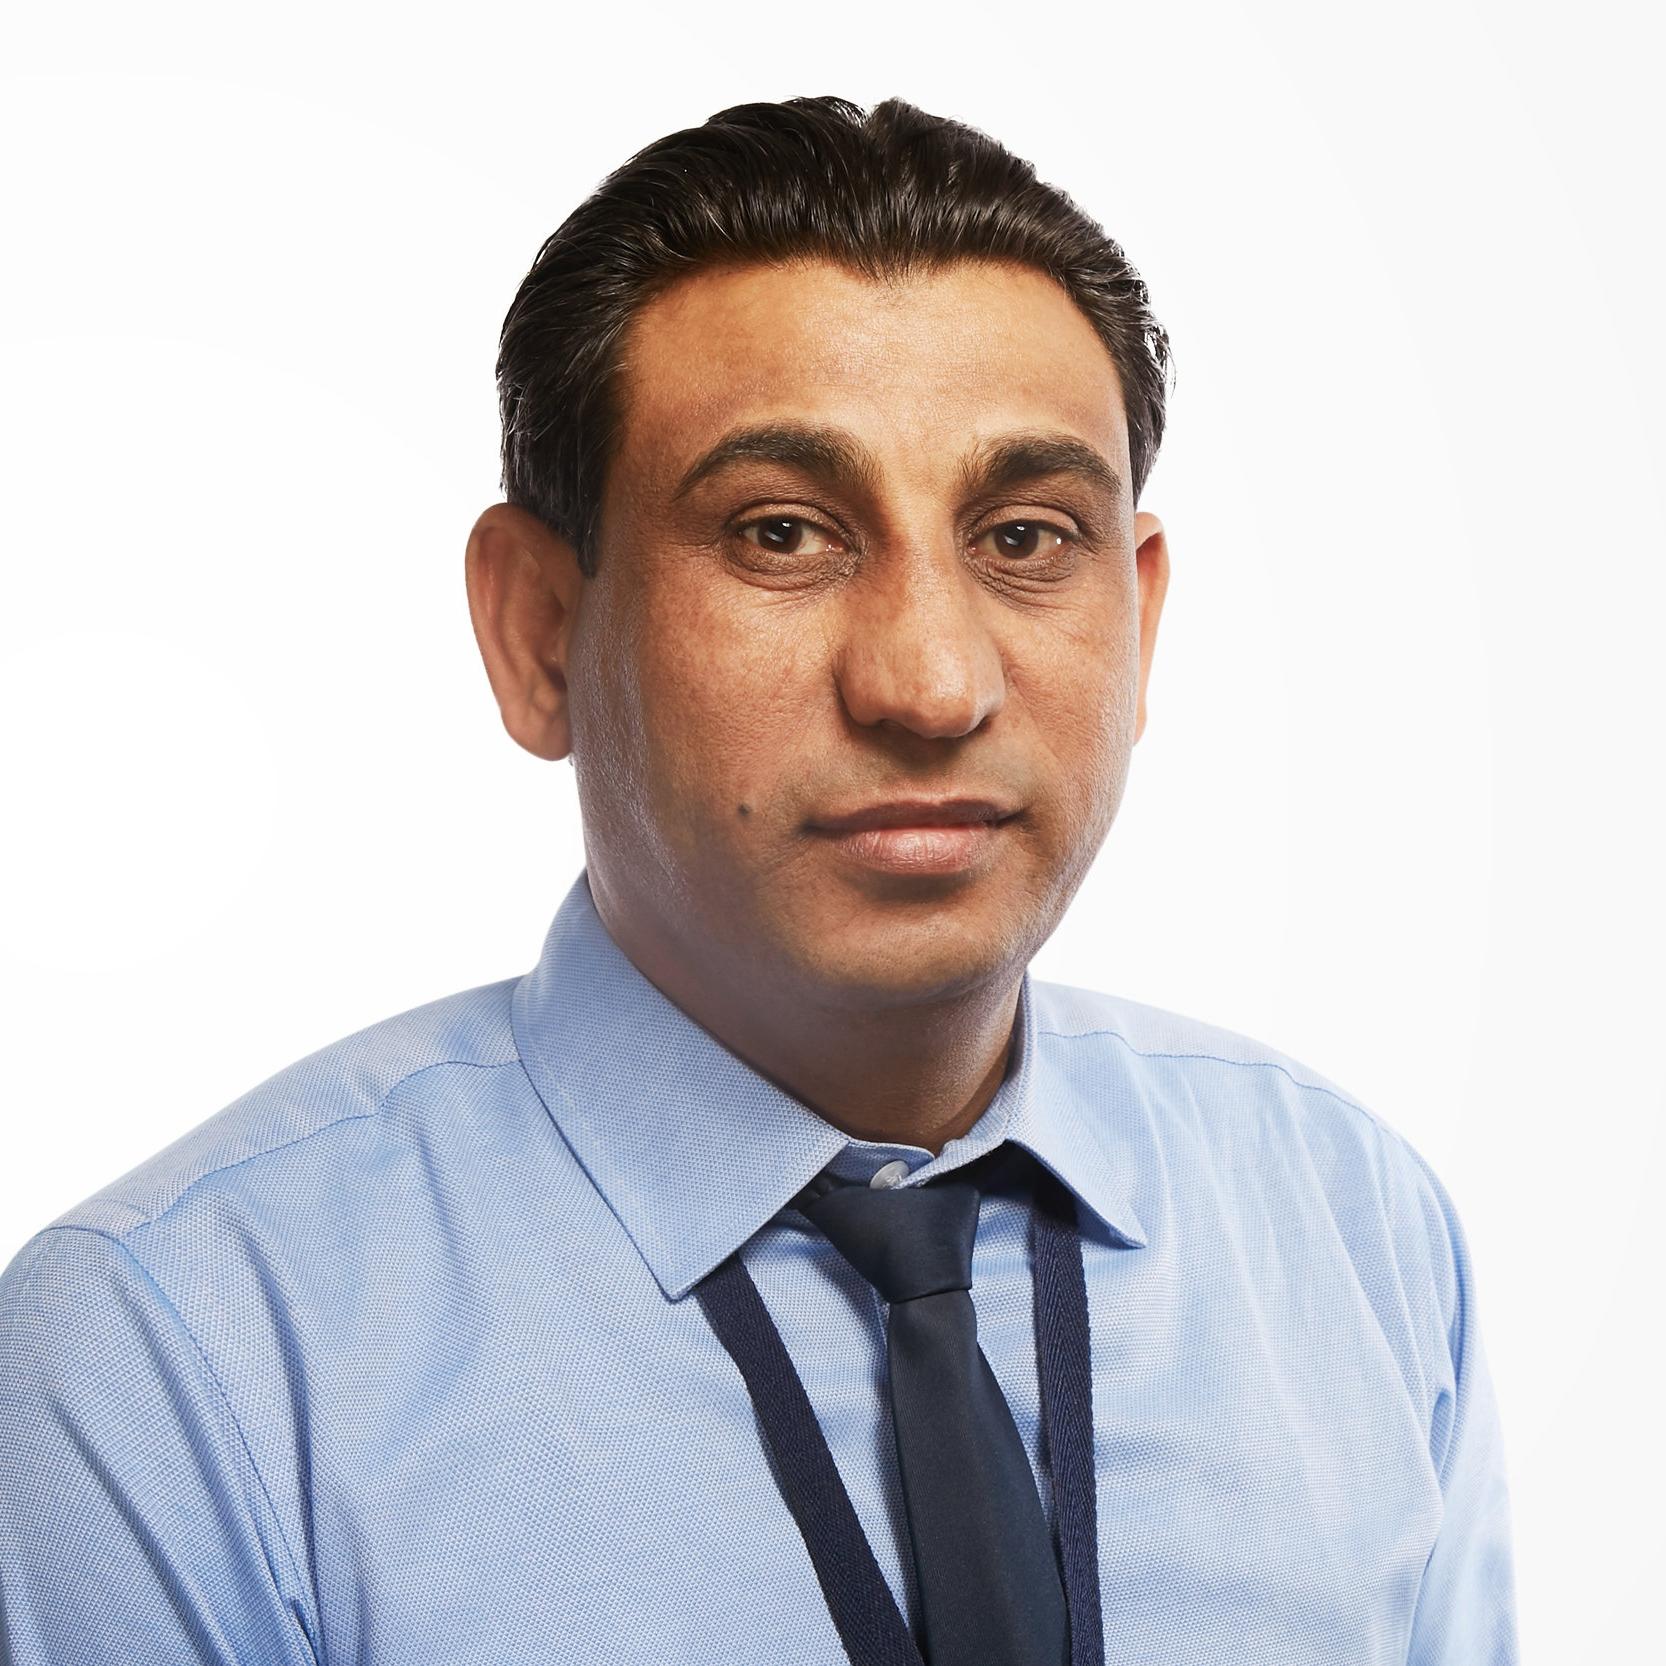 Mr. Khaled A. Aziz